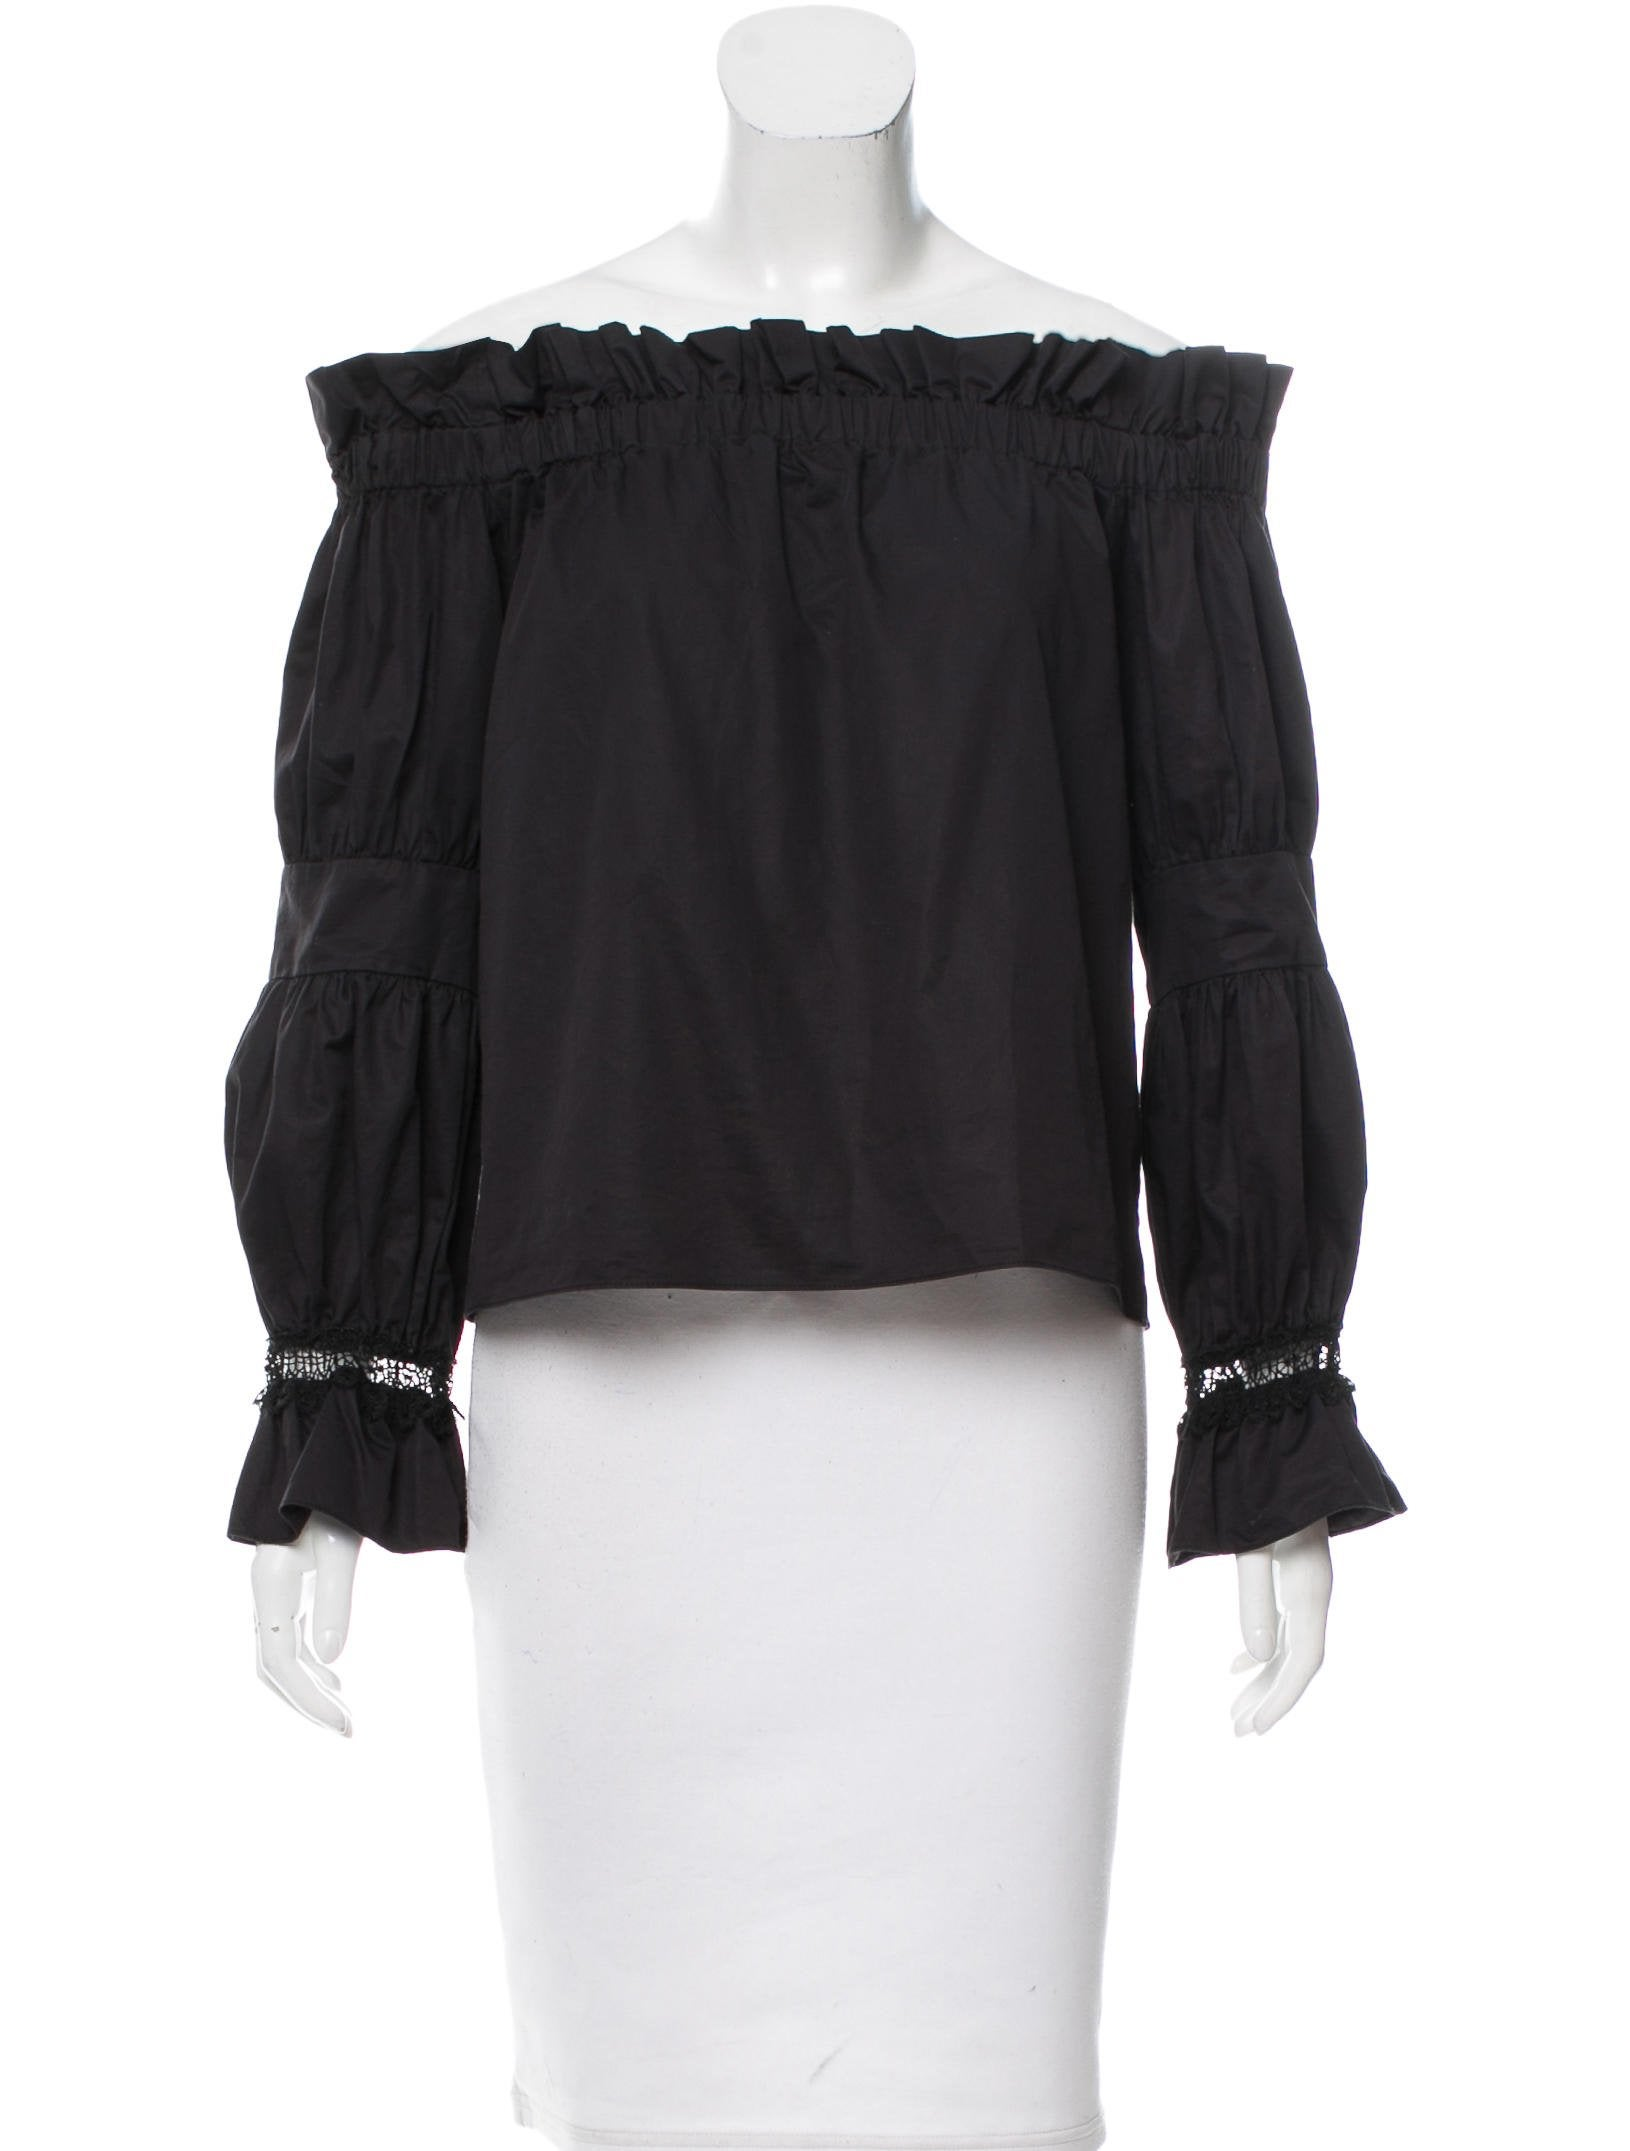 0de45af02350e Alexis Off-The-Shoulder Top Long Sleeve Top - Clothing - WEX23099 ...